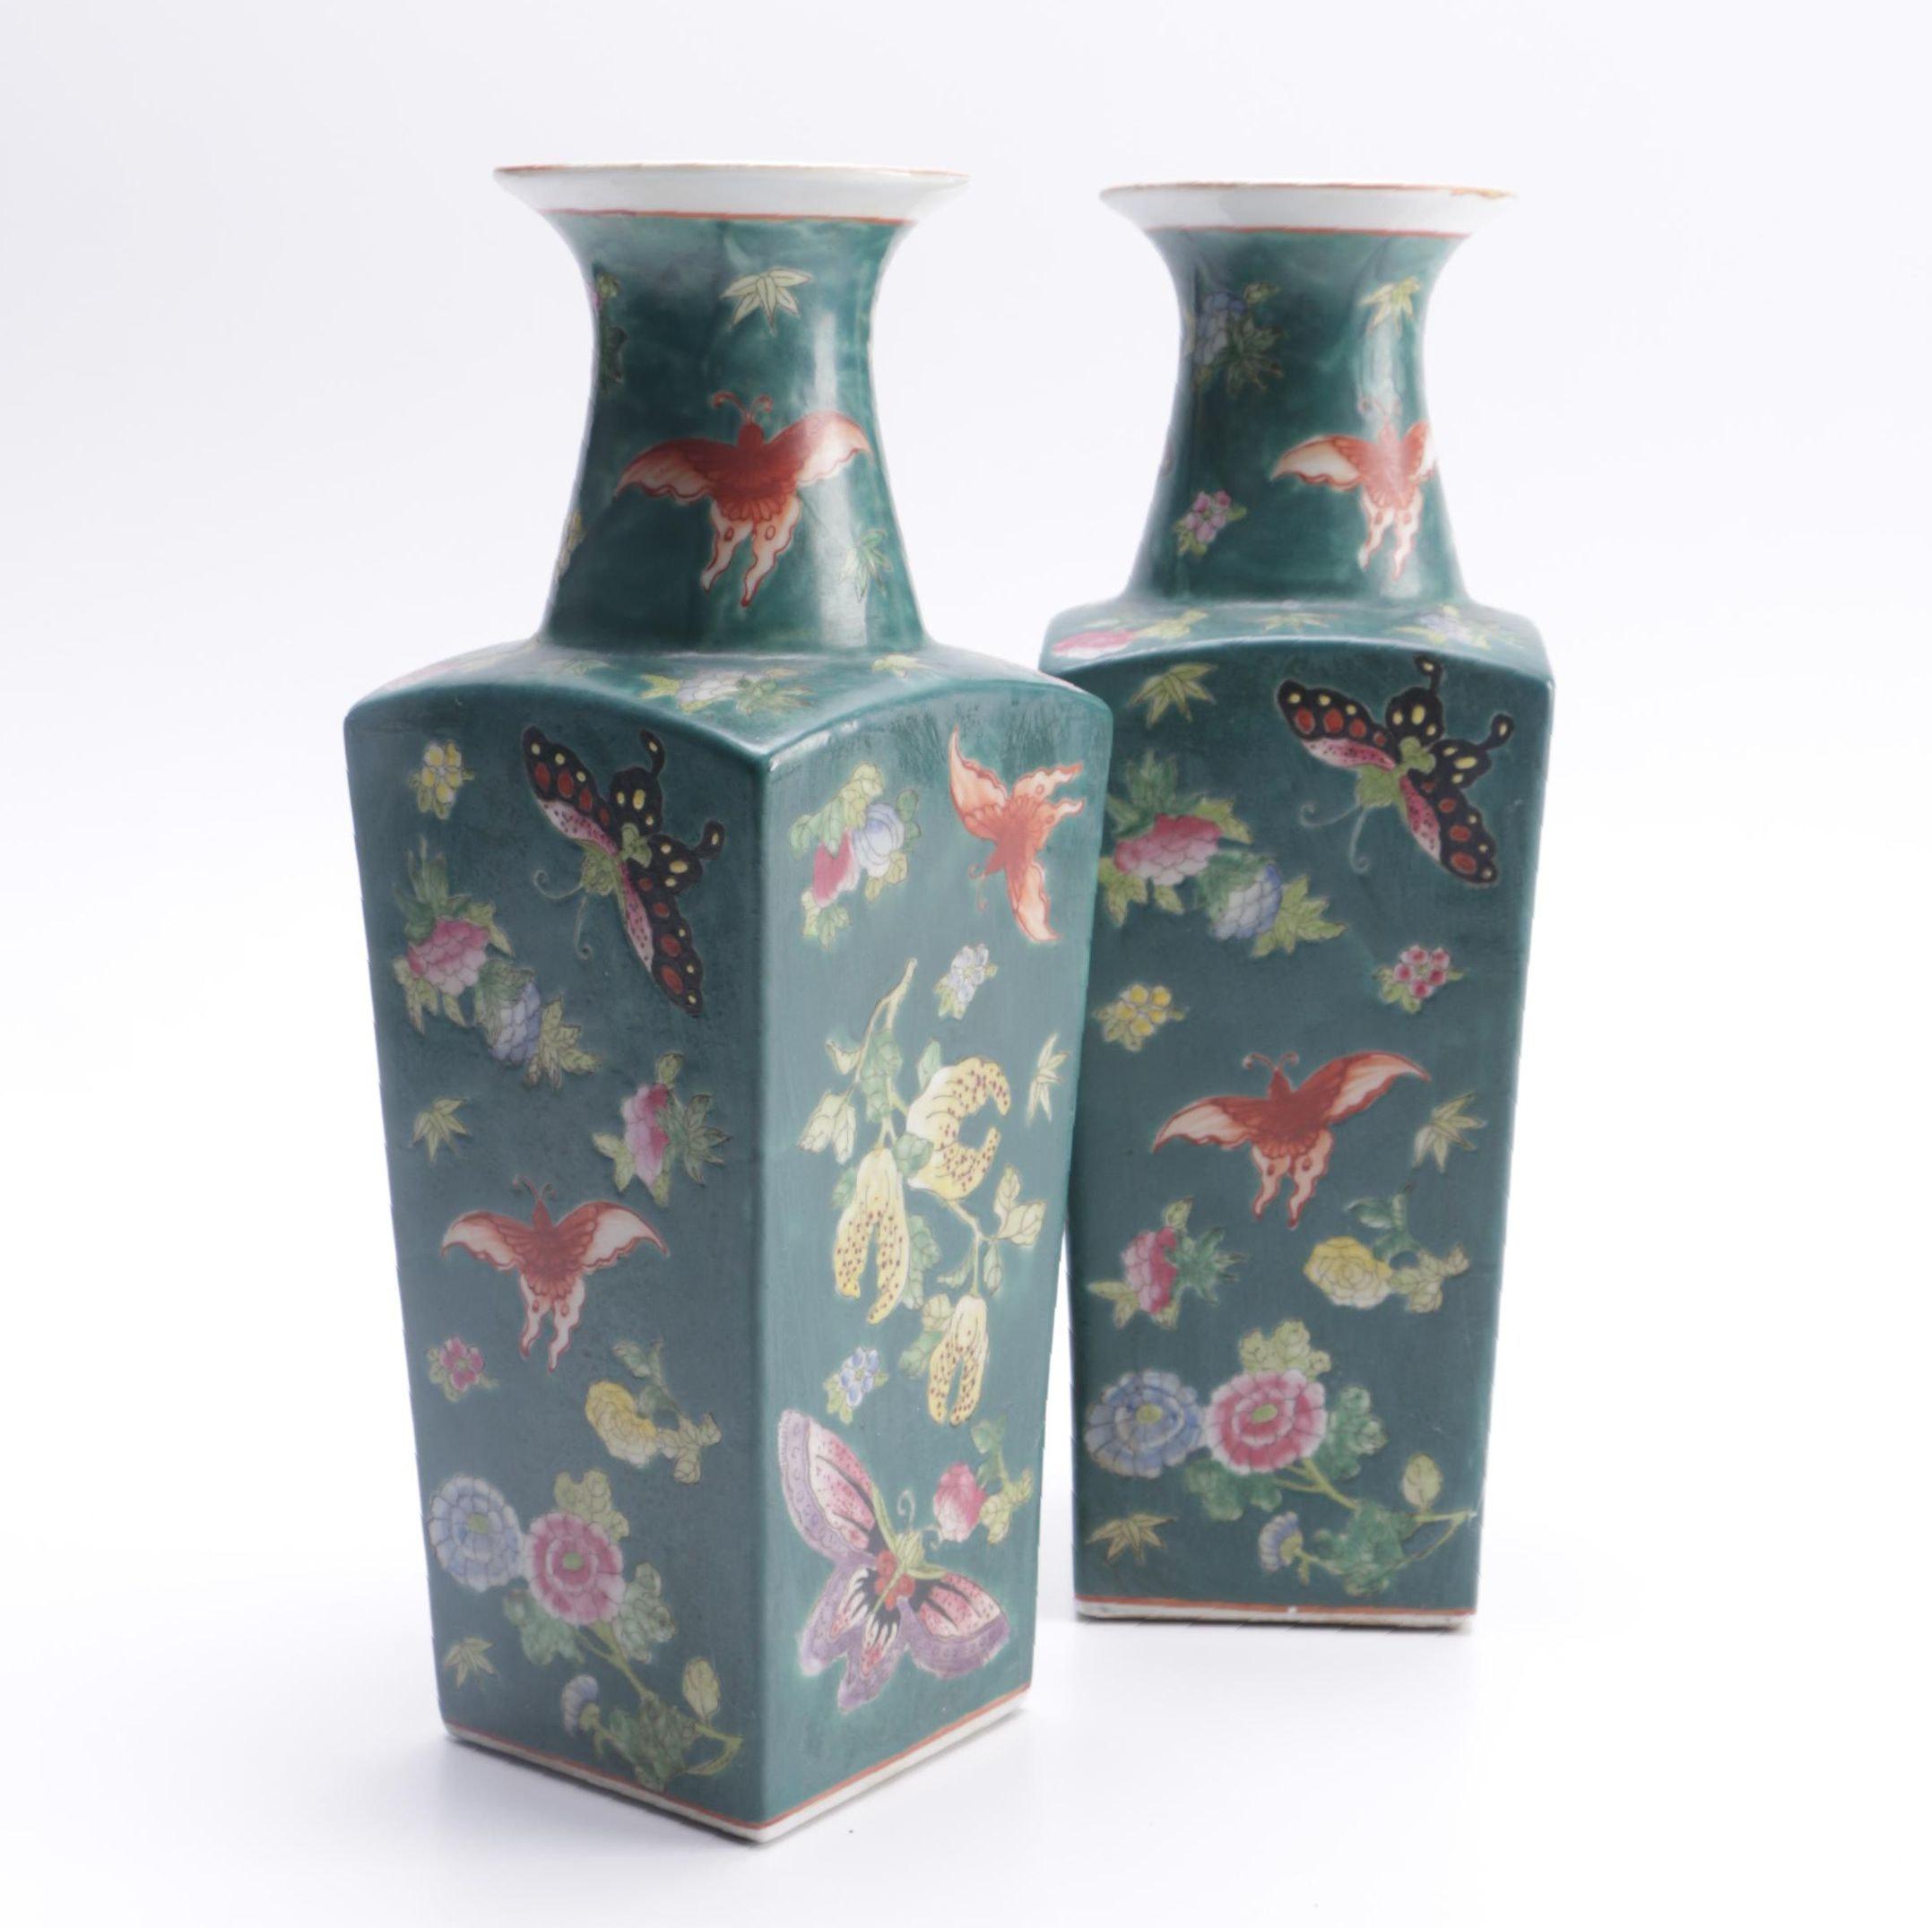 Chinese Green Ceramic Vases